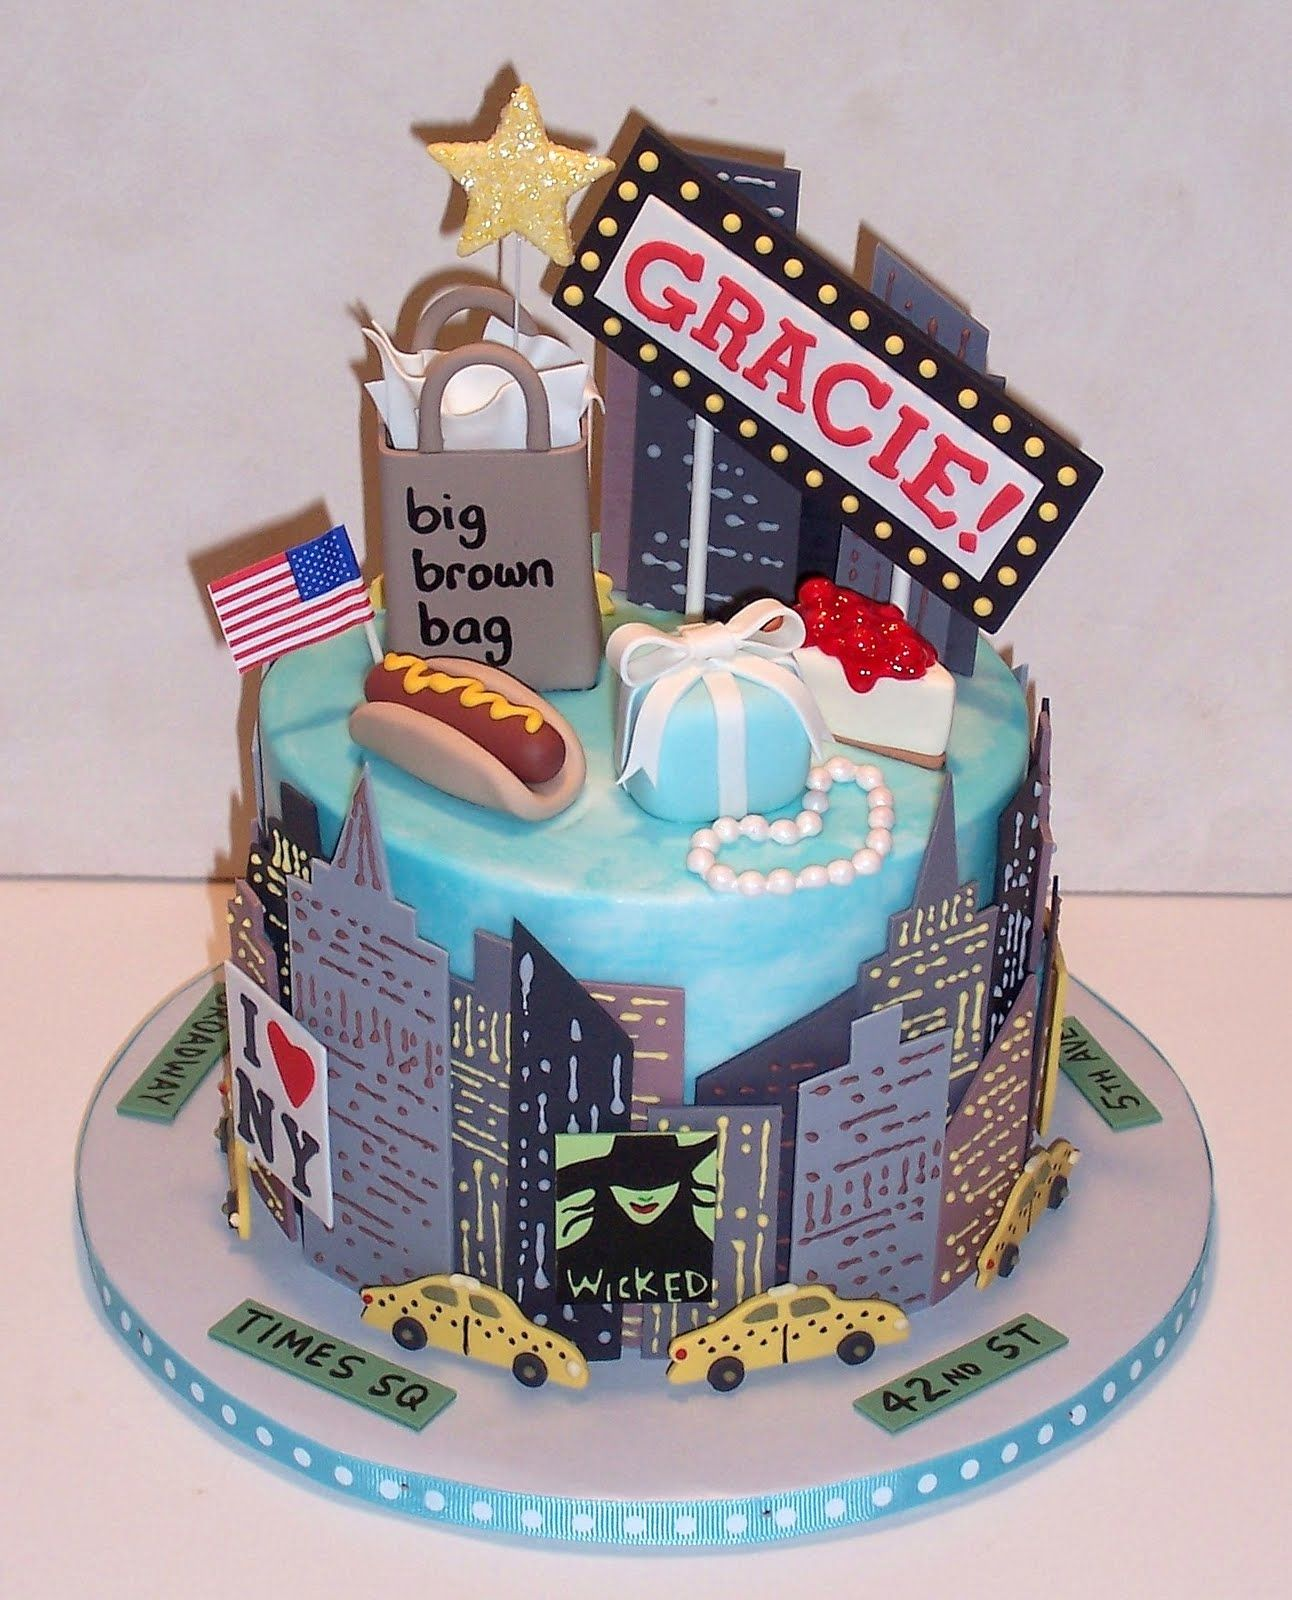 New York cake | Baking & cooking | Pinterest | Birthday cake nyc ...